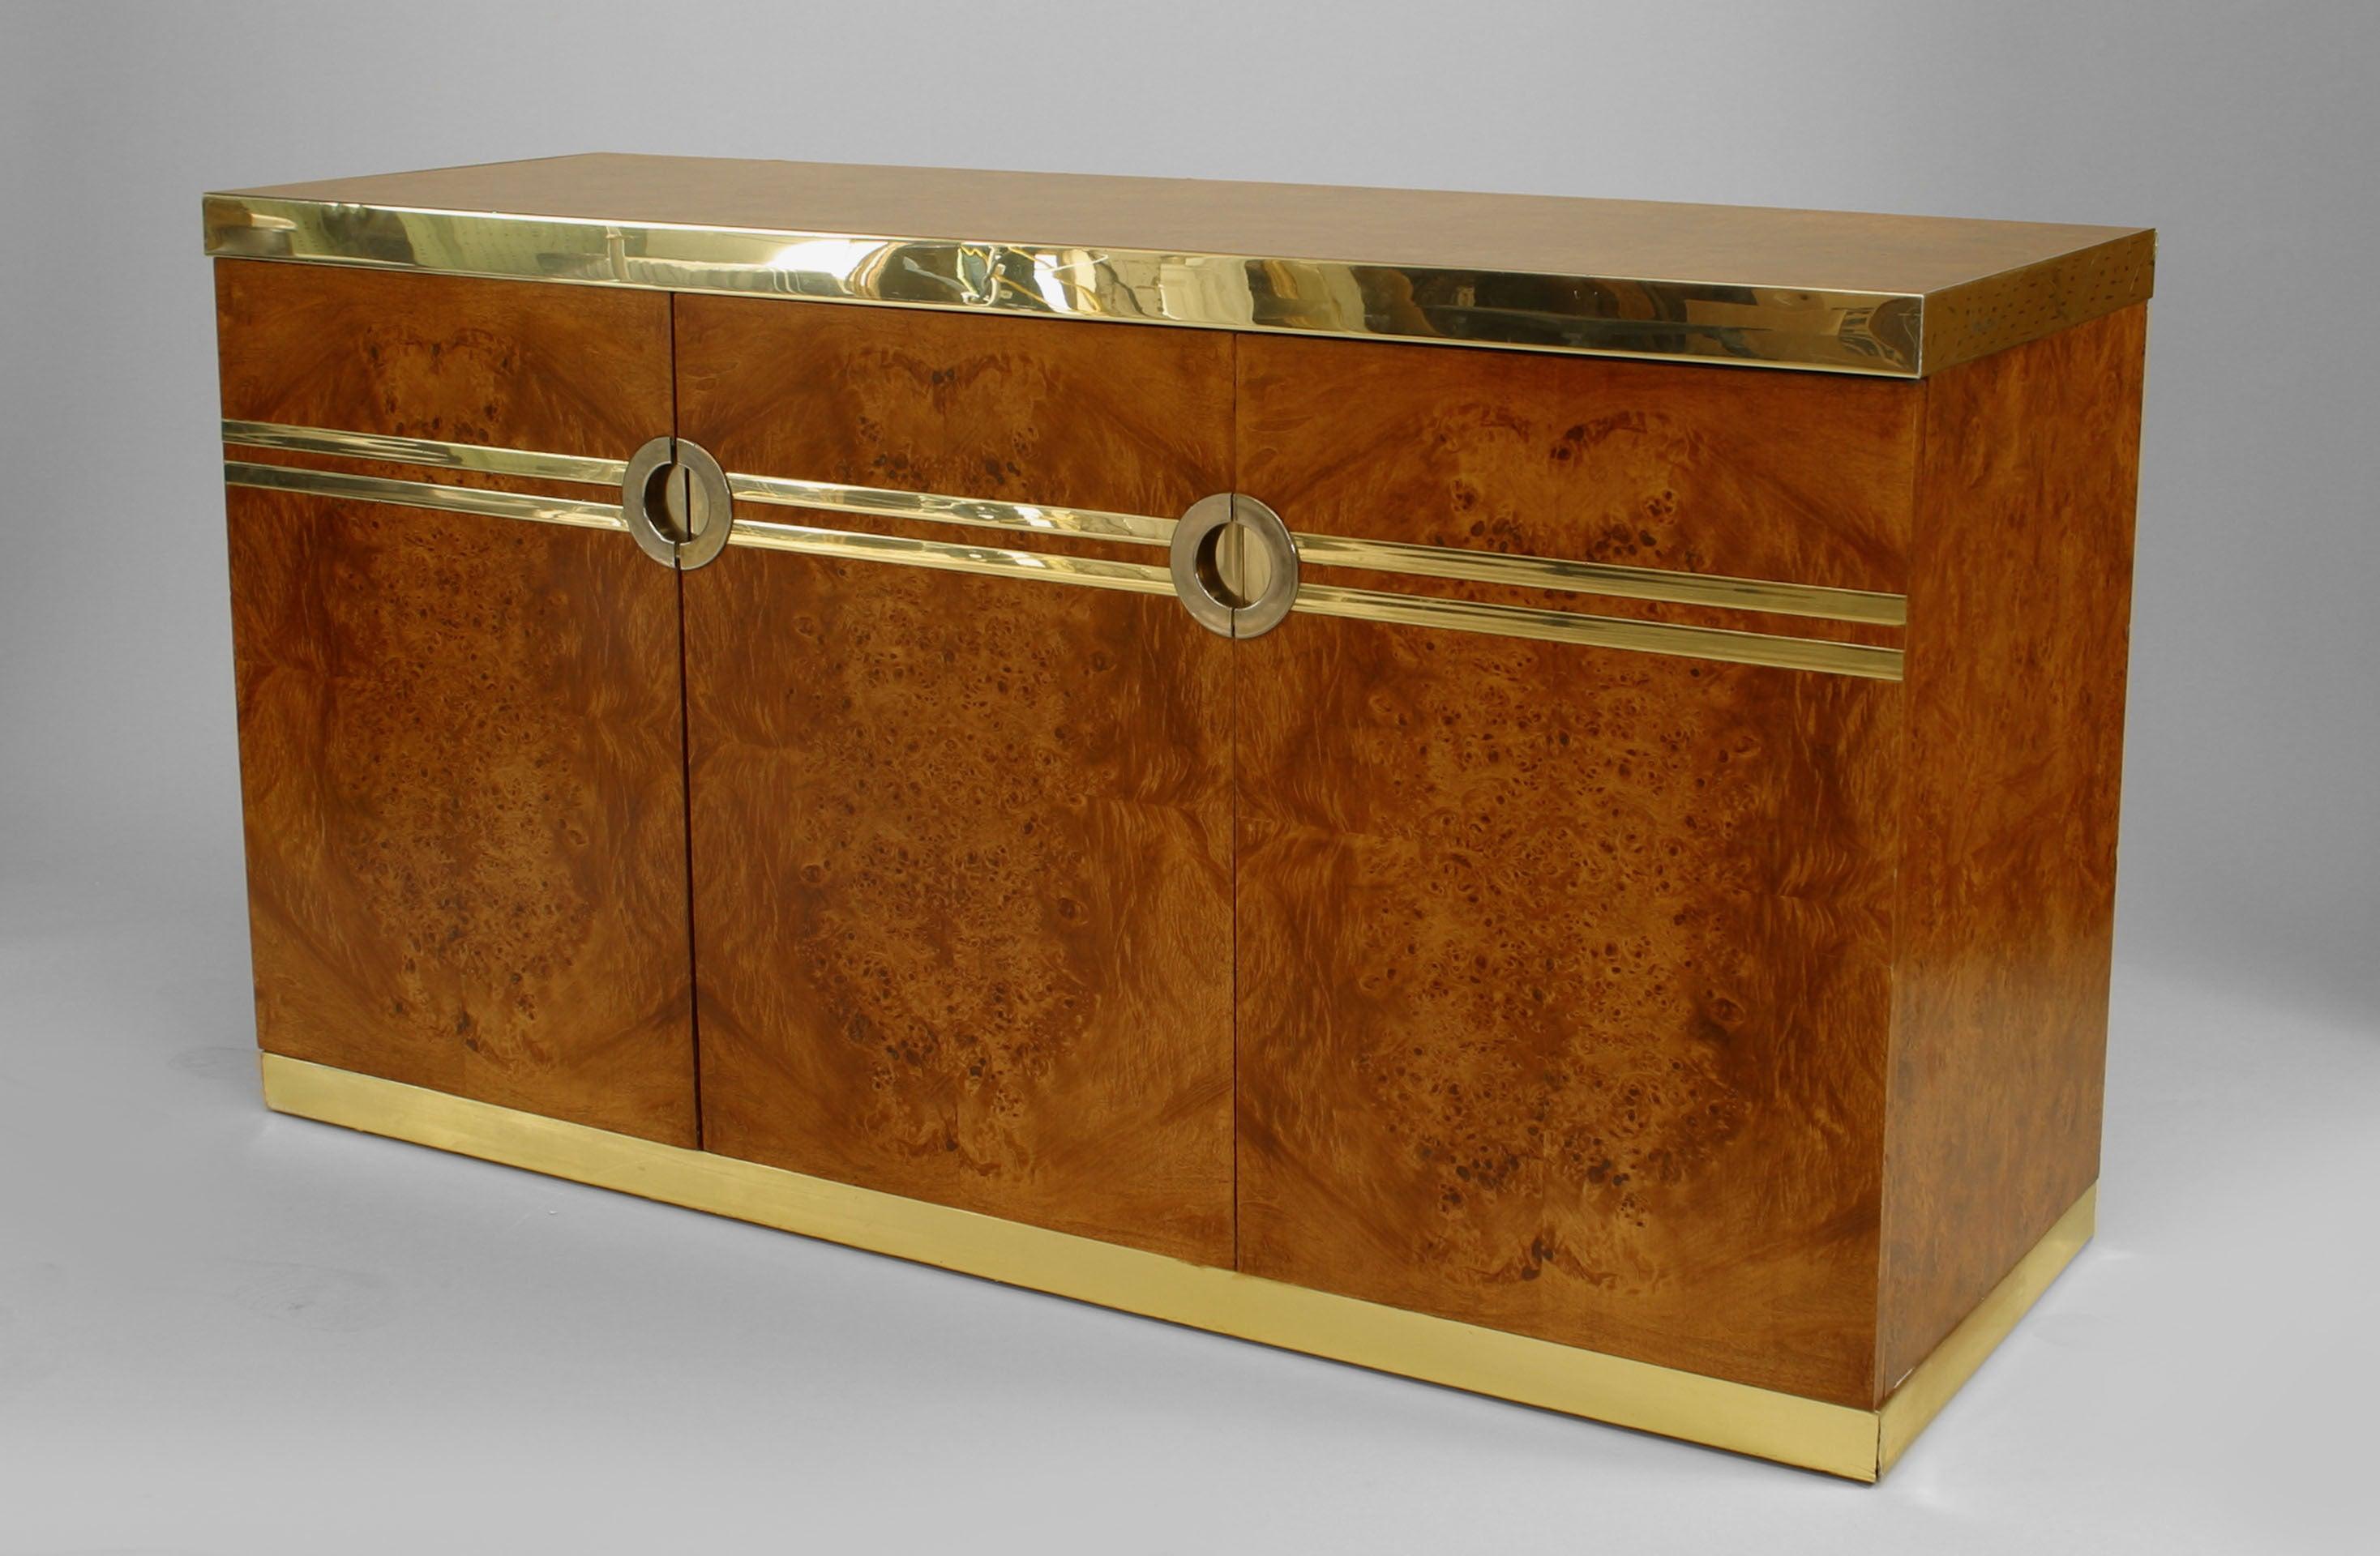 1970's Pierre Cardin Burl Walnut And Brass Buffet